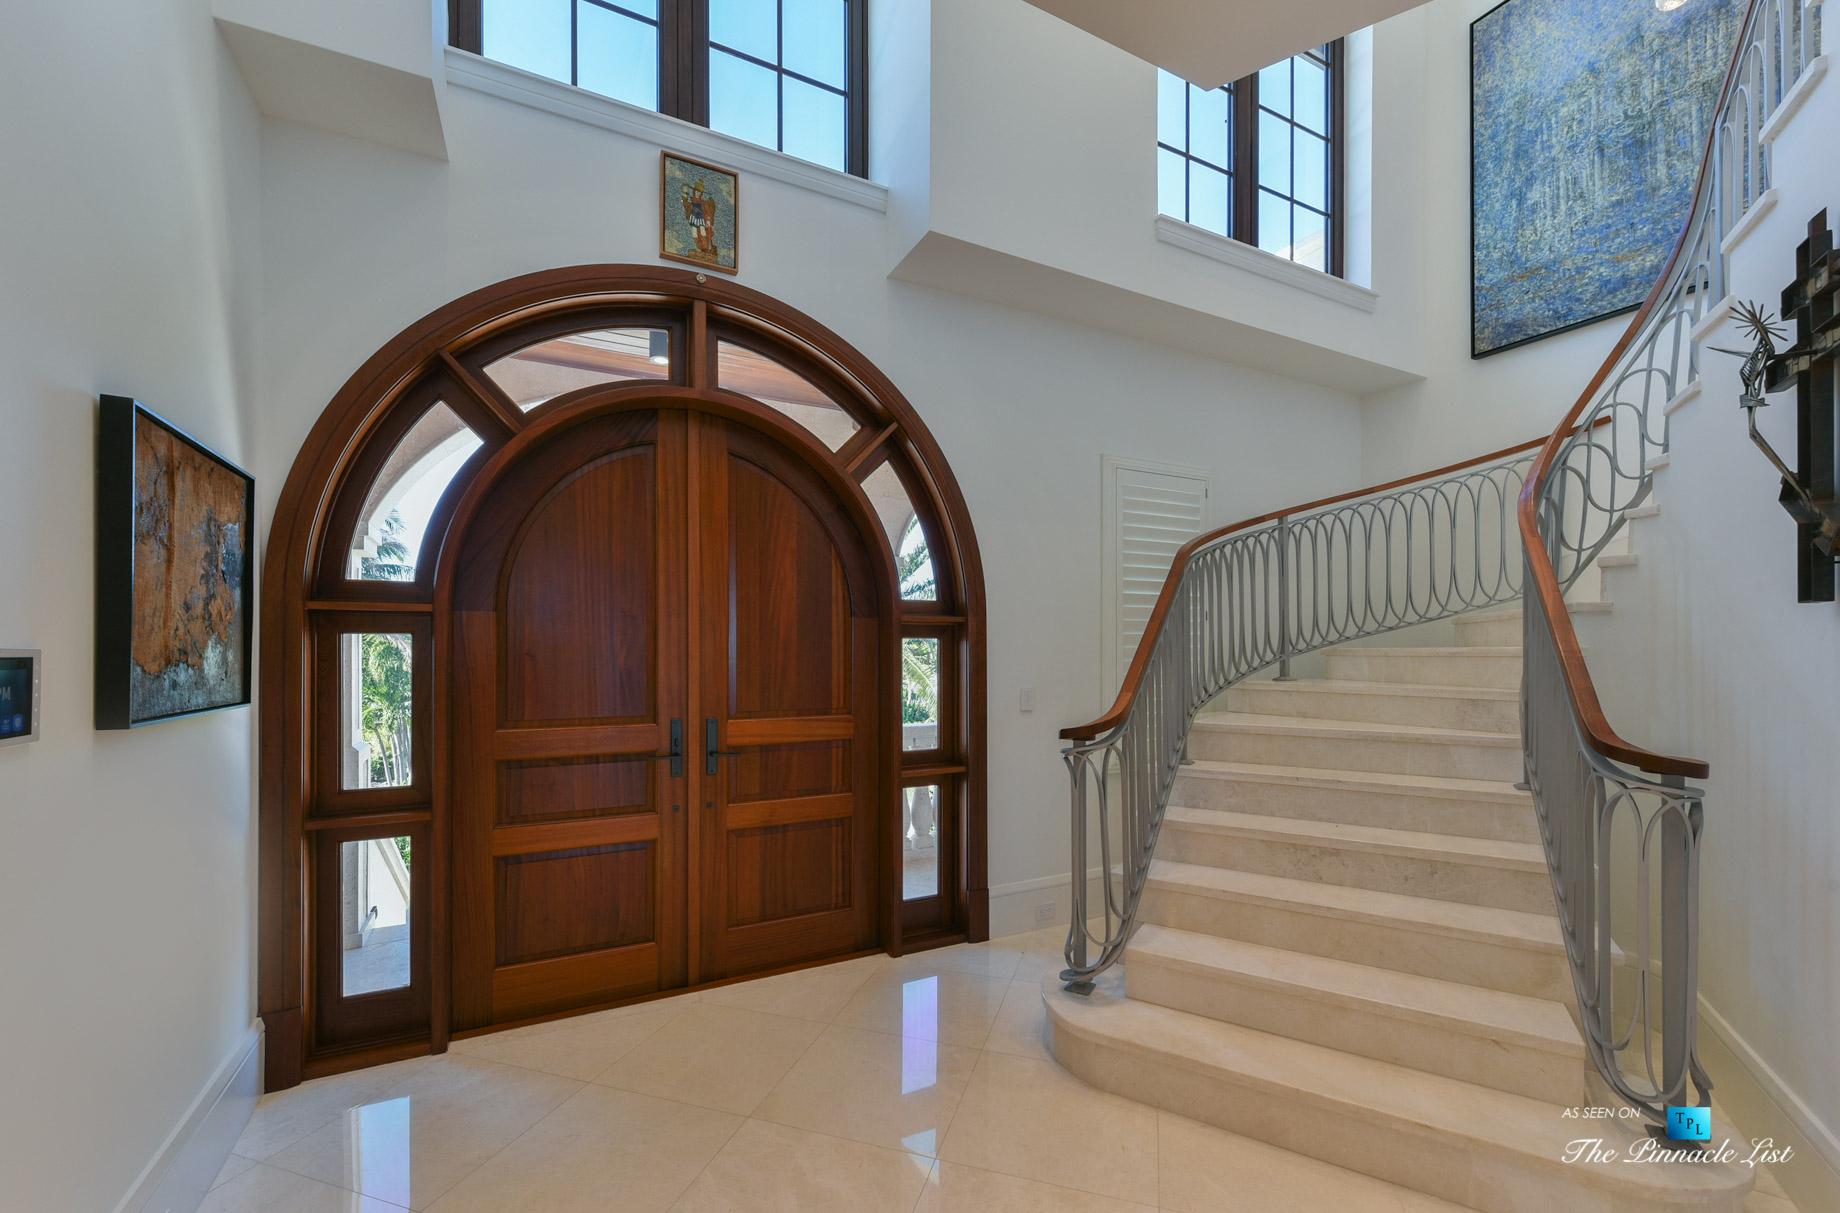 103 Andros Rd, Key Largo, FL, USA - Foyer - Luxury Real Estate - Ocean Reef Club Home